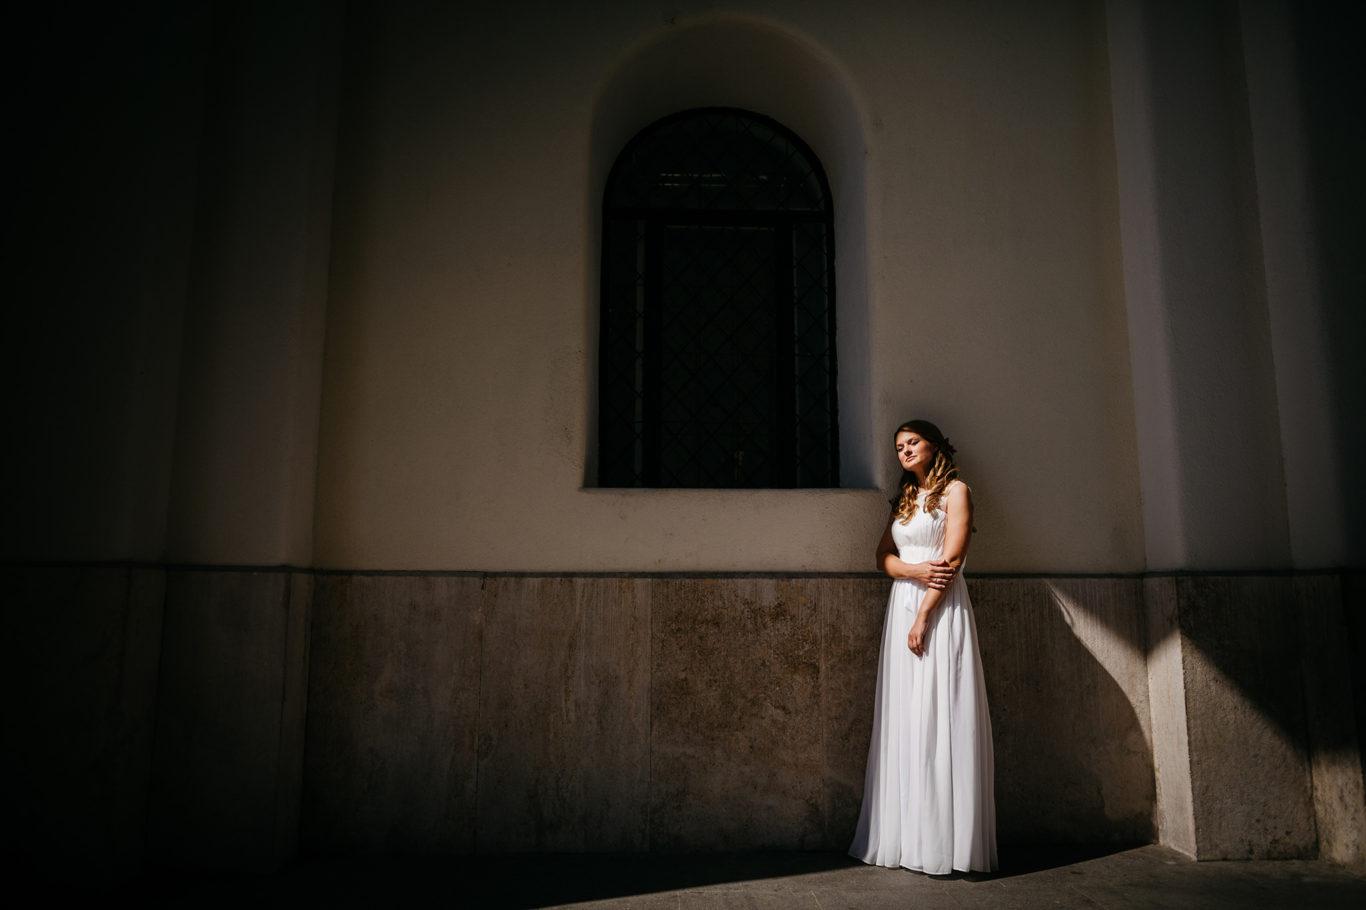 0163-fotografie-nunta-bucuresti-rodica-rares-fotograf-ciprian-dumitrescu-dc1_0039